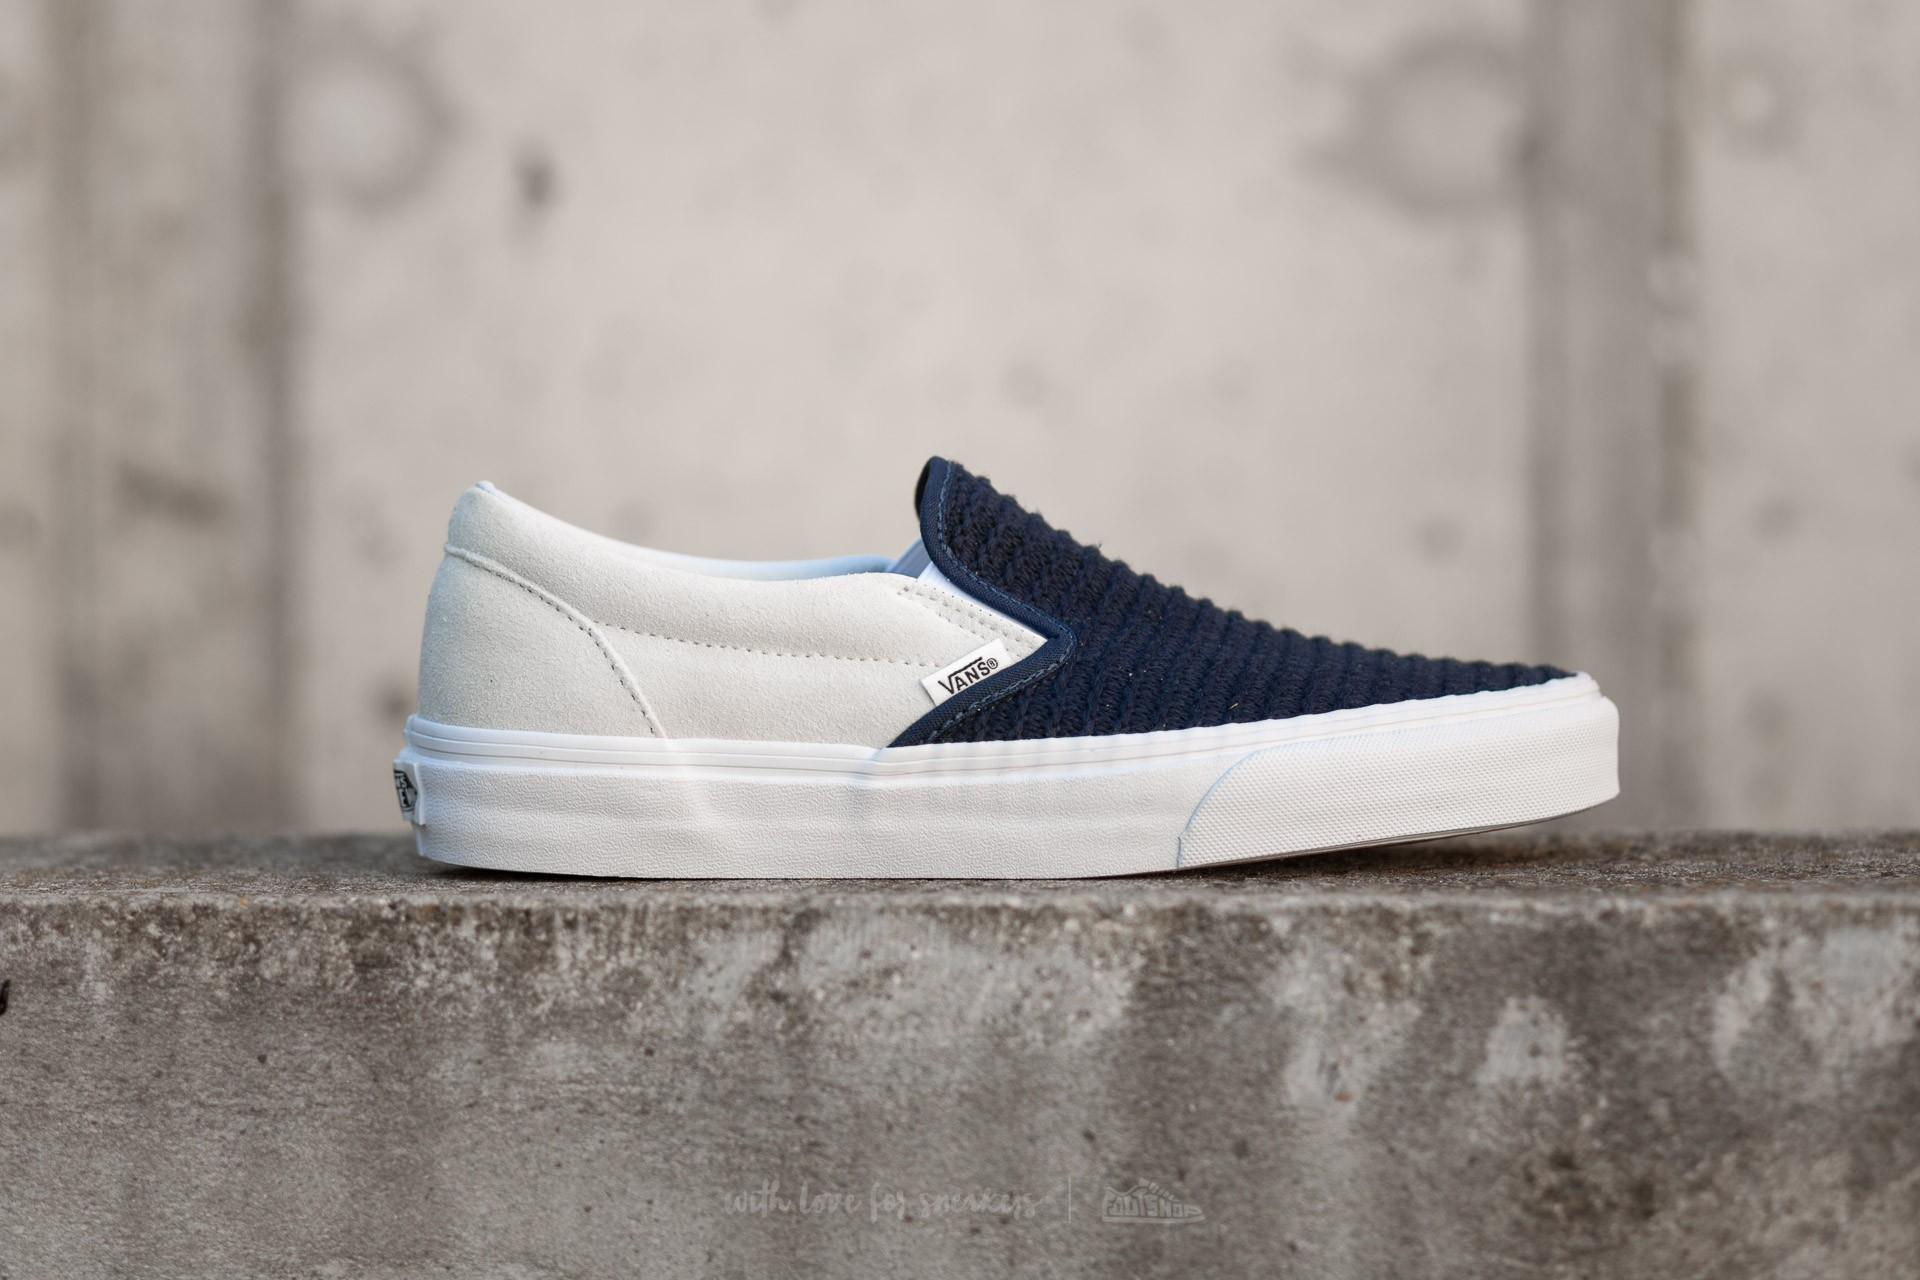 edb5bbb425 Vans Classic Slip-On (Suede/ Woven) Navy Blue/ True White   Footshop